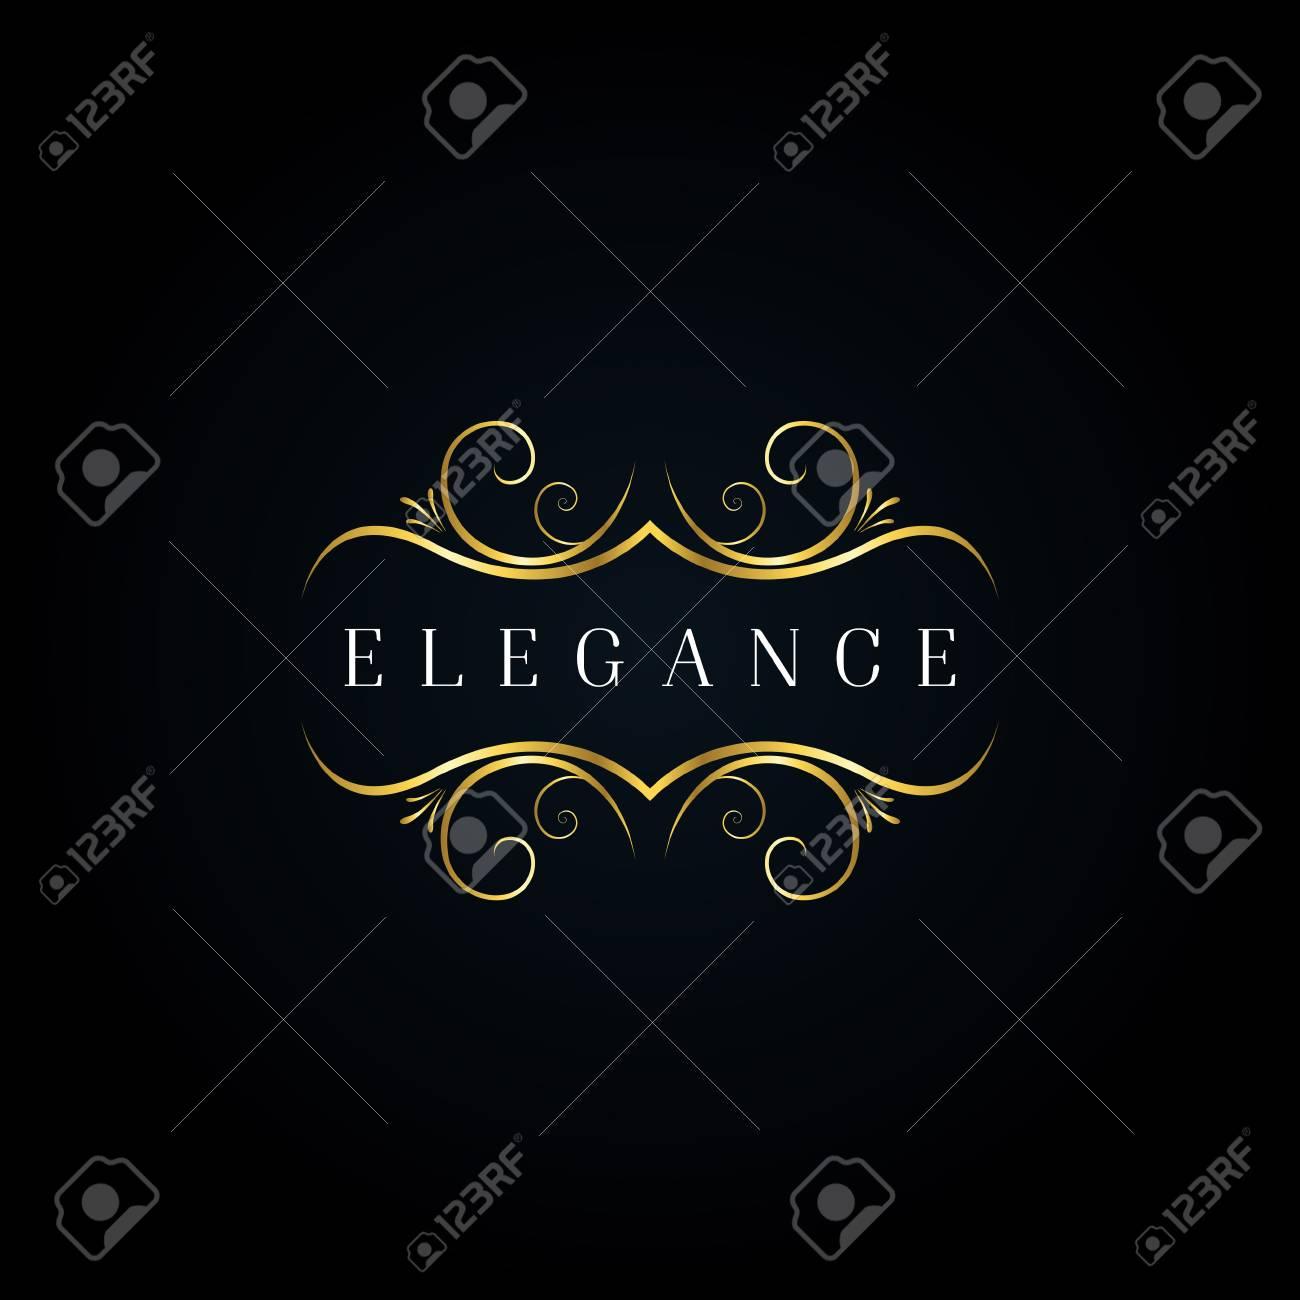 Gold Elegance Ornament Logo - 125123866